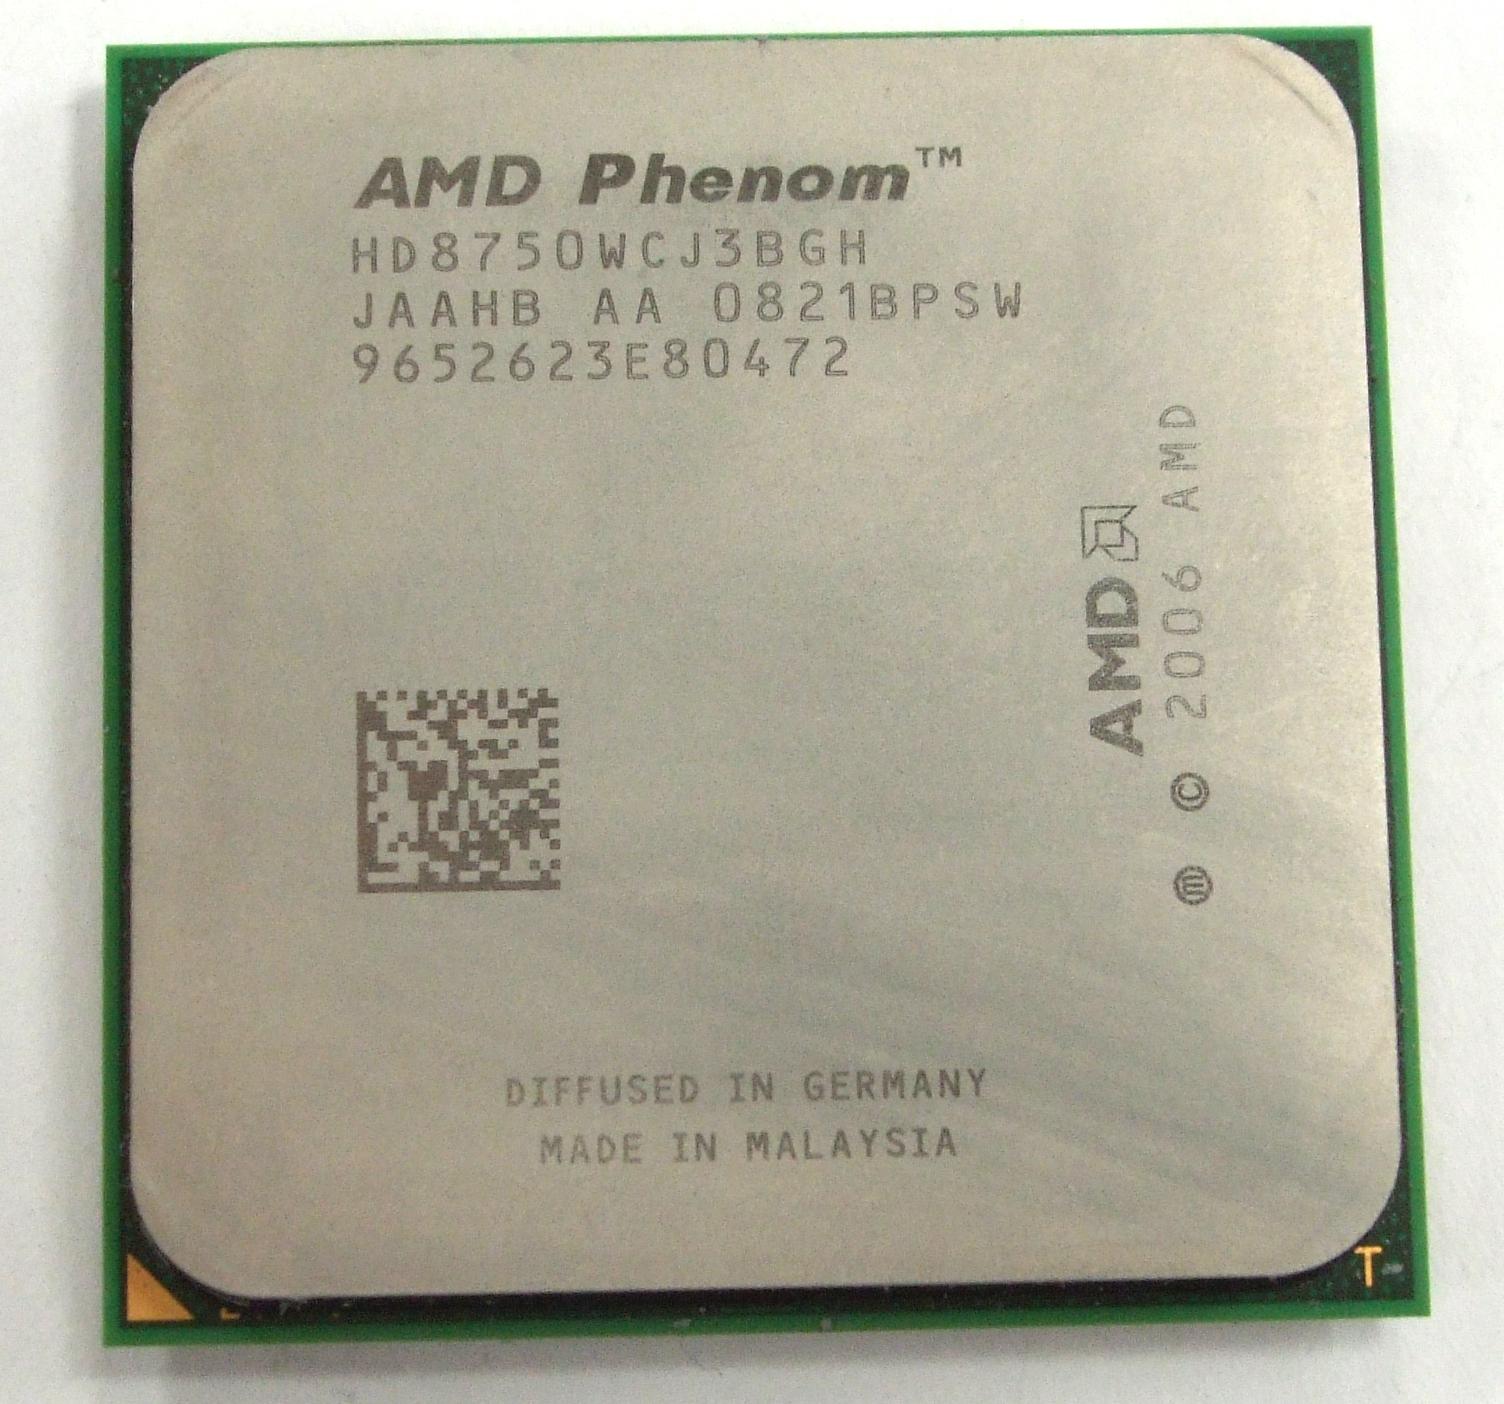 HD8750WCJ3BGH AMD Phenom X3 8750 Socket AM2+ Tri-Core Processor